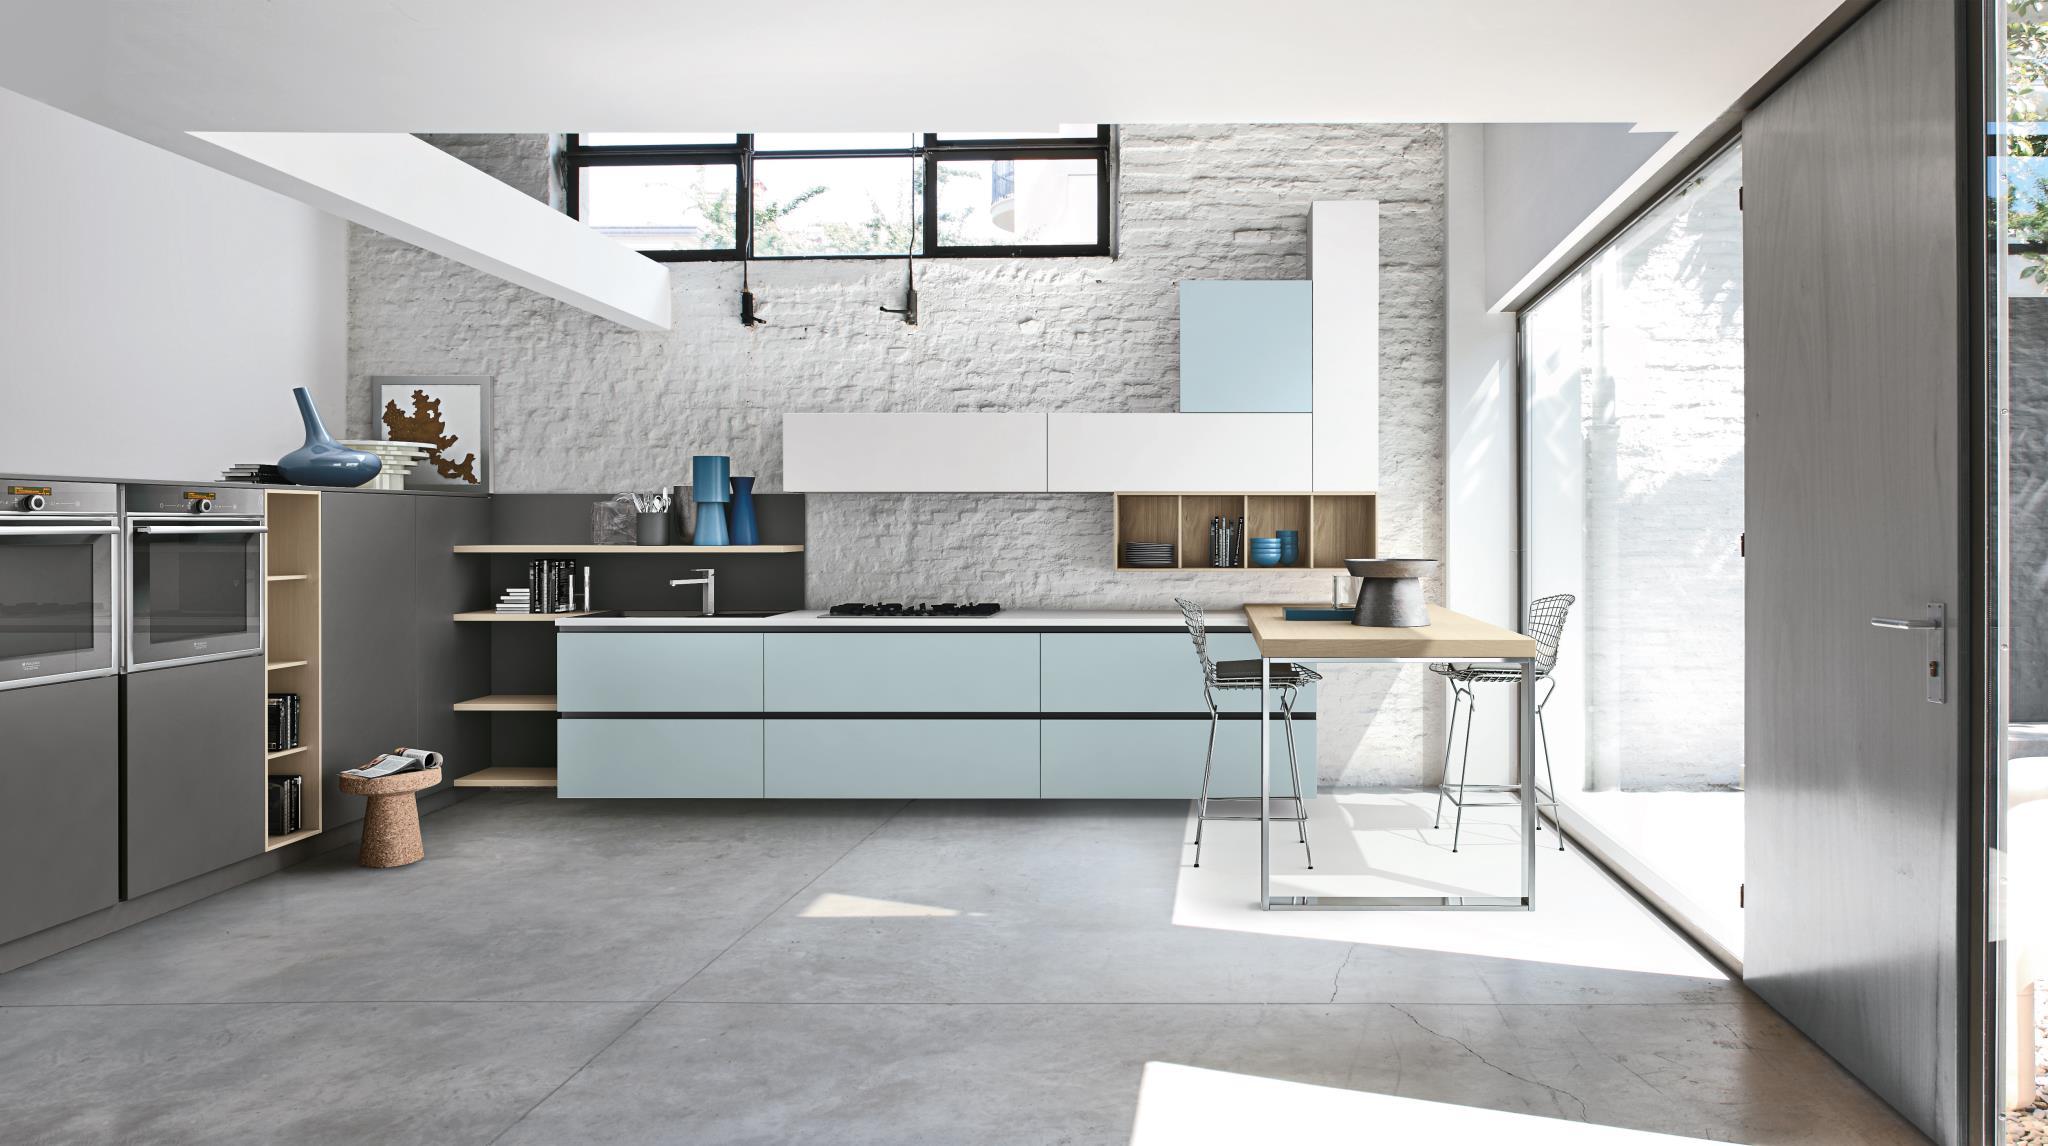 Interni d 39 autore arredamenti cucina moderna for Architecture fonctionnelle